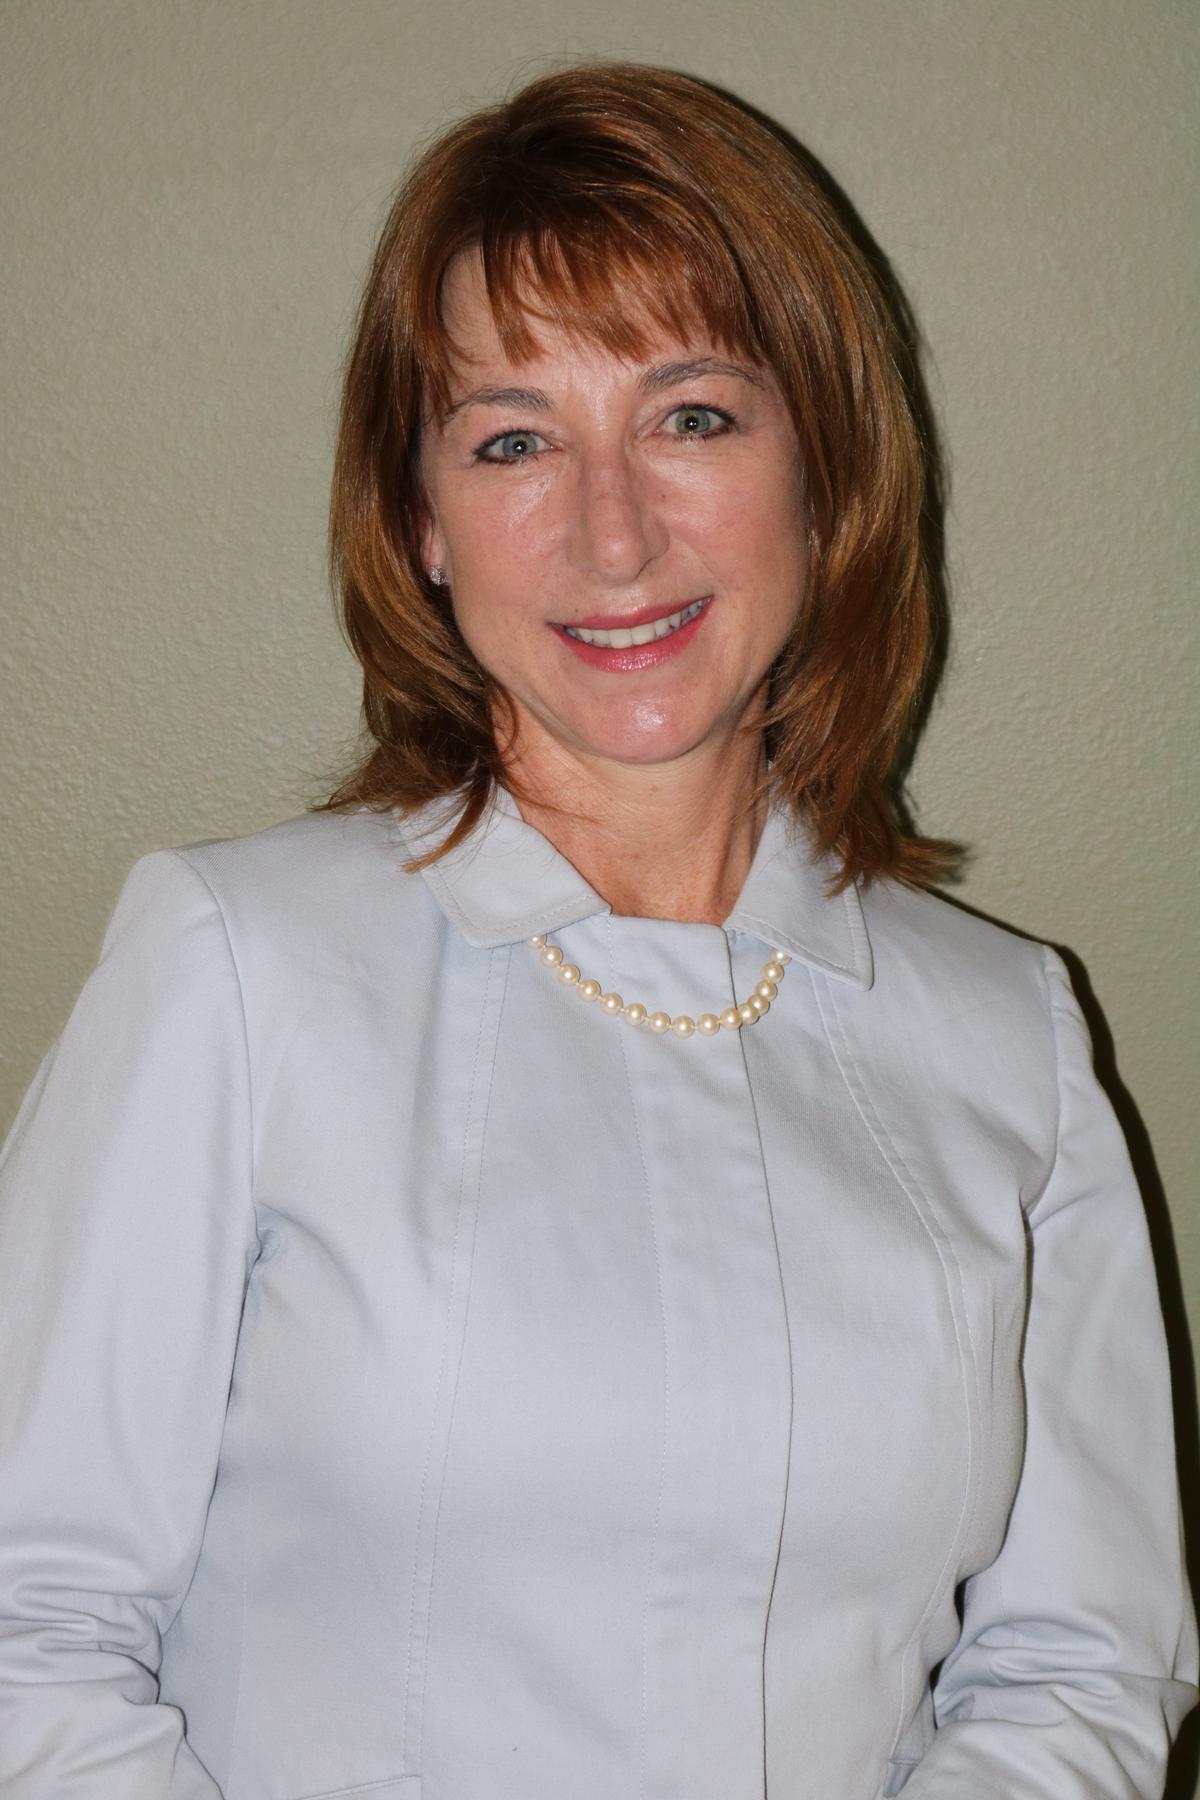 Dr. Beth Christian